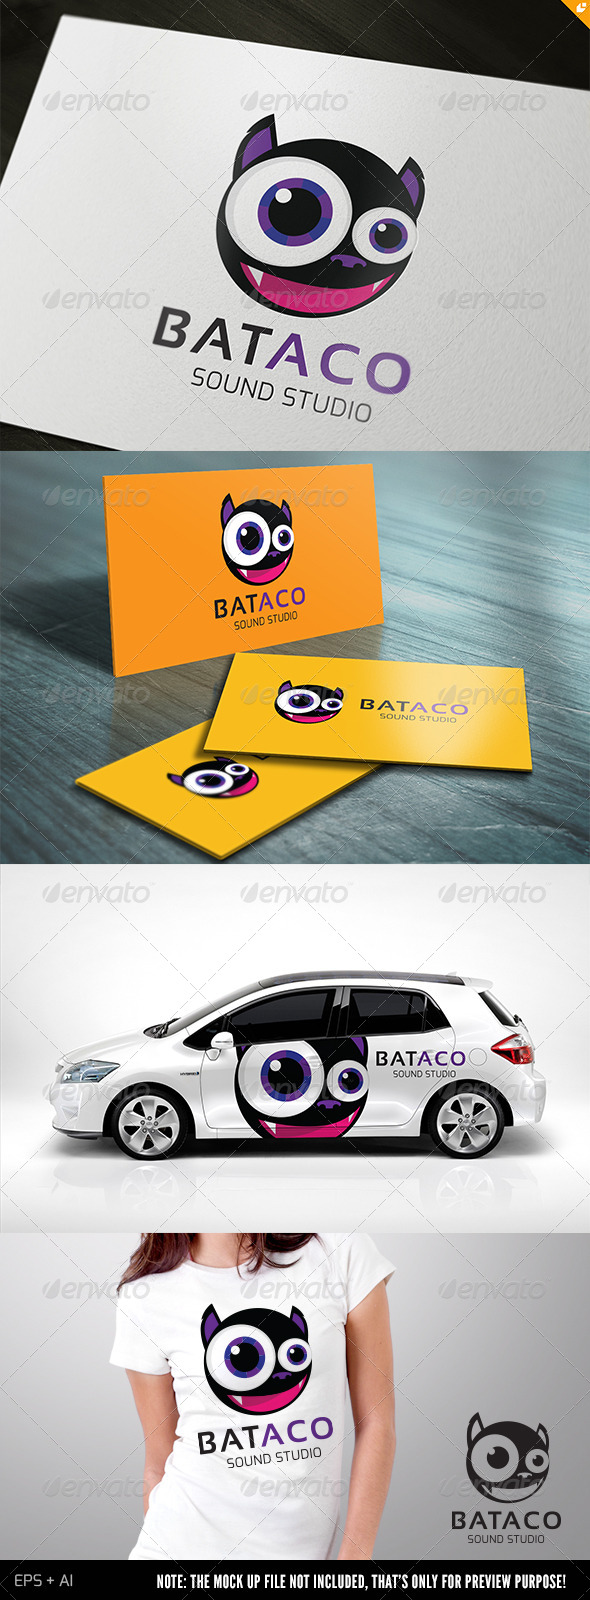 GraphicRiver Bat Aco Sound Studio 5107935